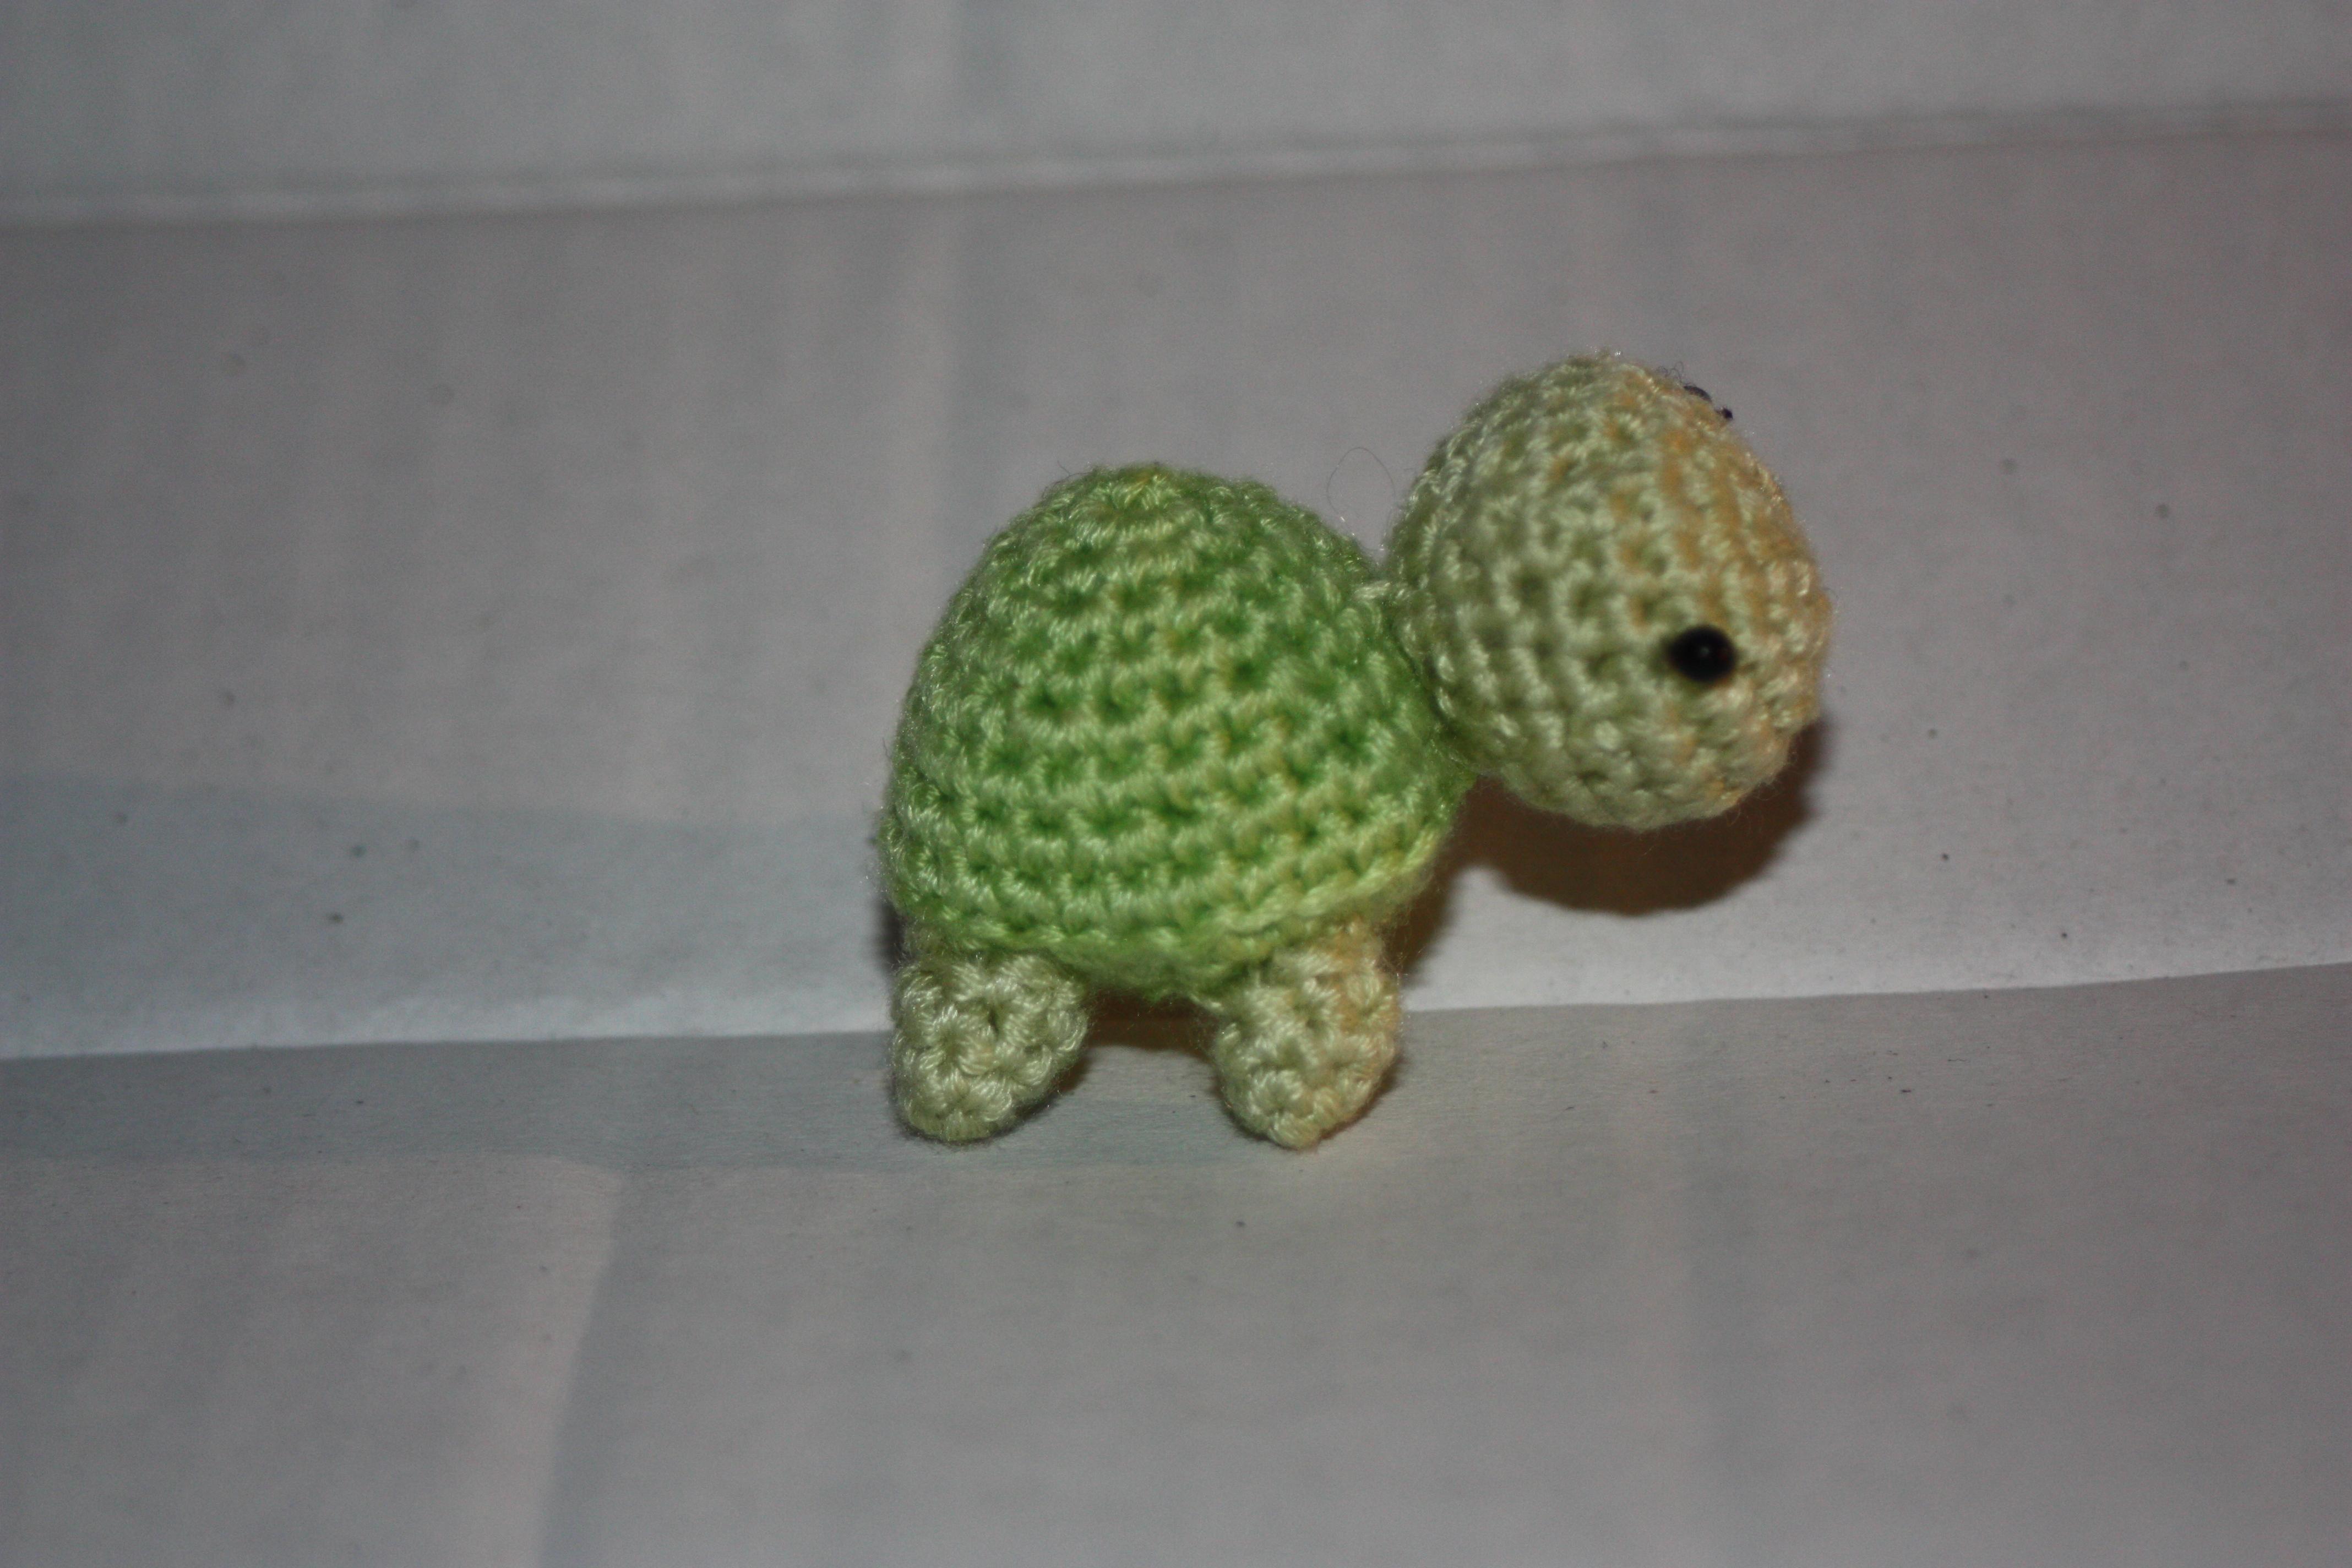 Amigurumi Pattern Generator : Amigurumi turtle by Lotties-Pockets on DeviantArt